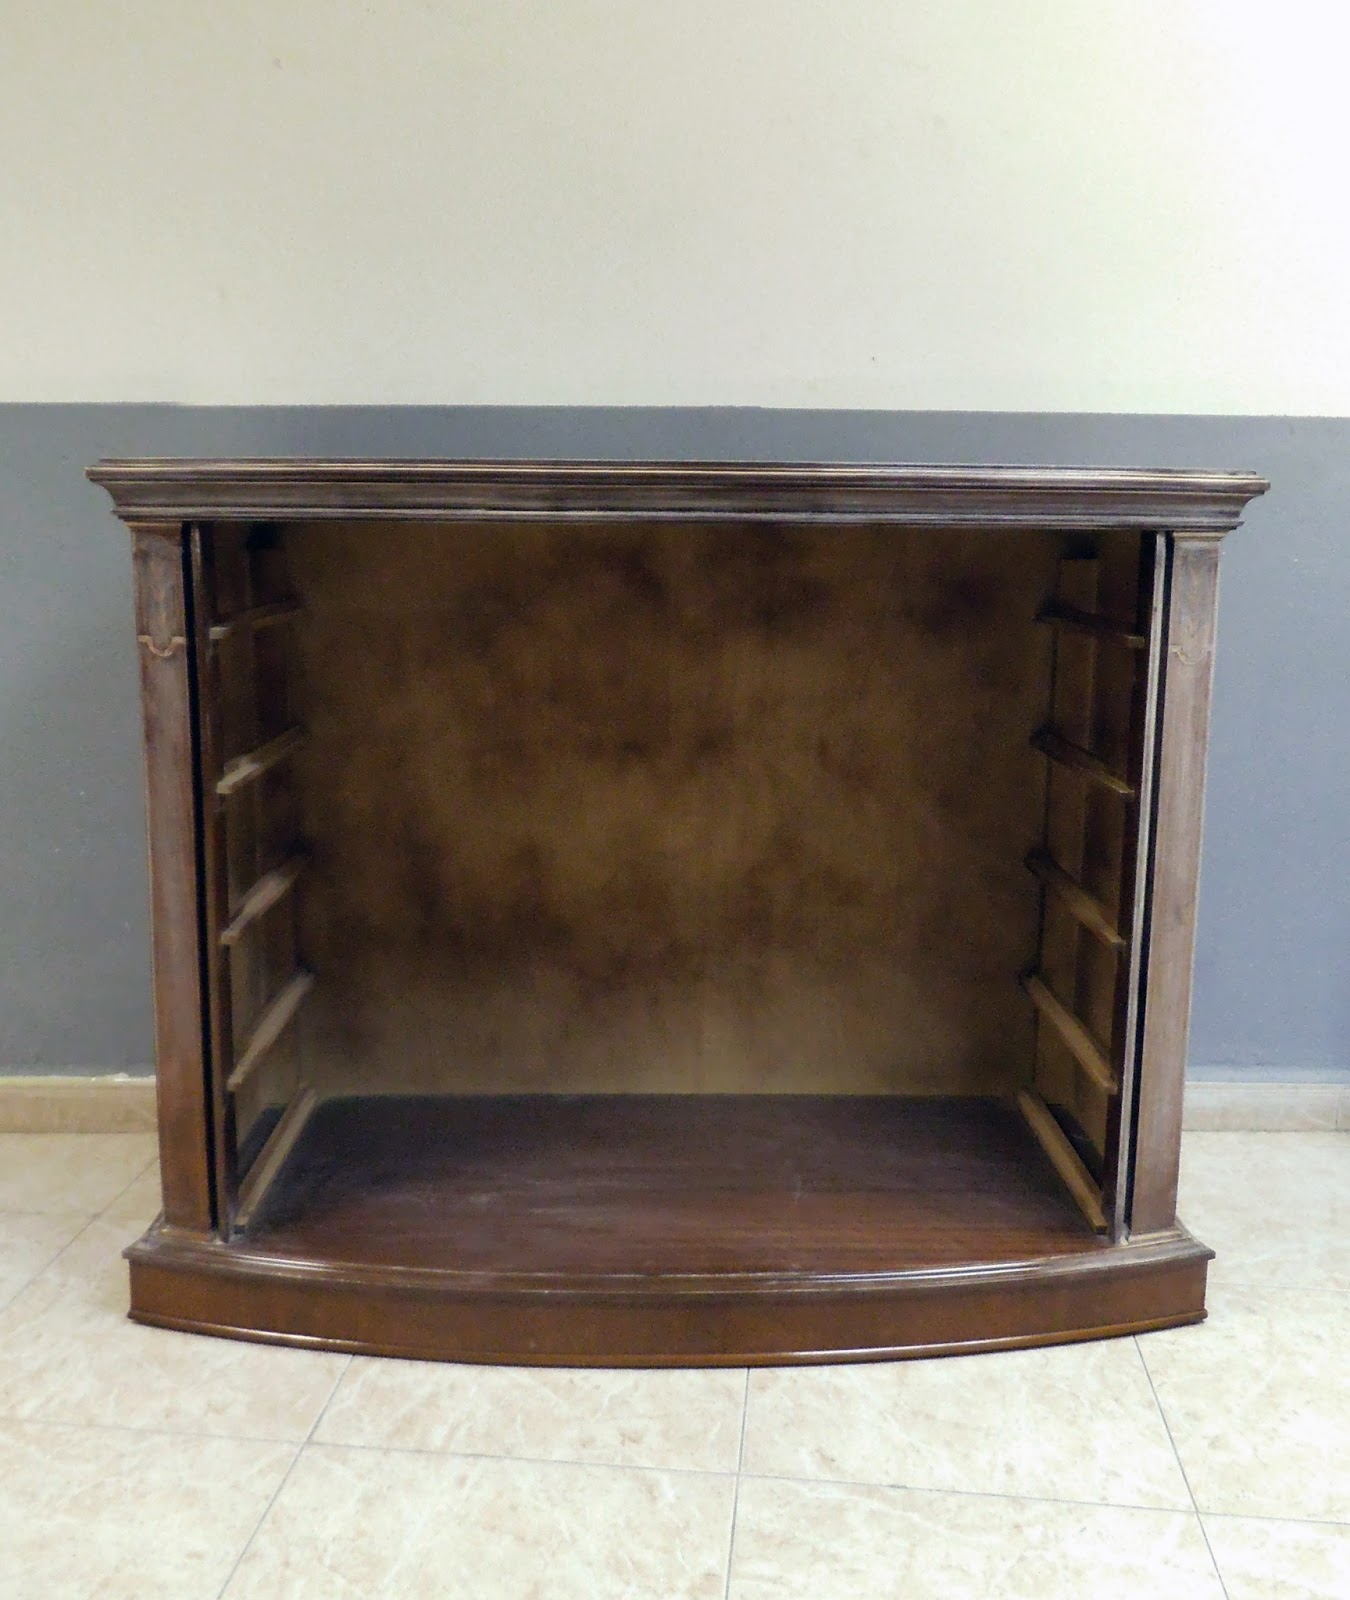 Renovarte muebles curso de restauraci n de muebles - Curso restauracion muebles barcelona ...